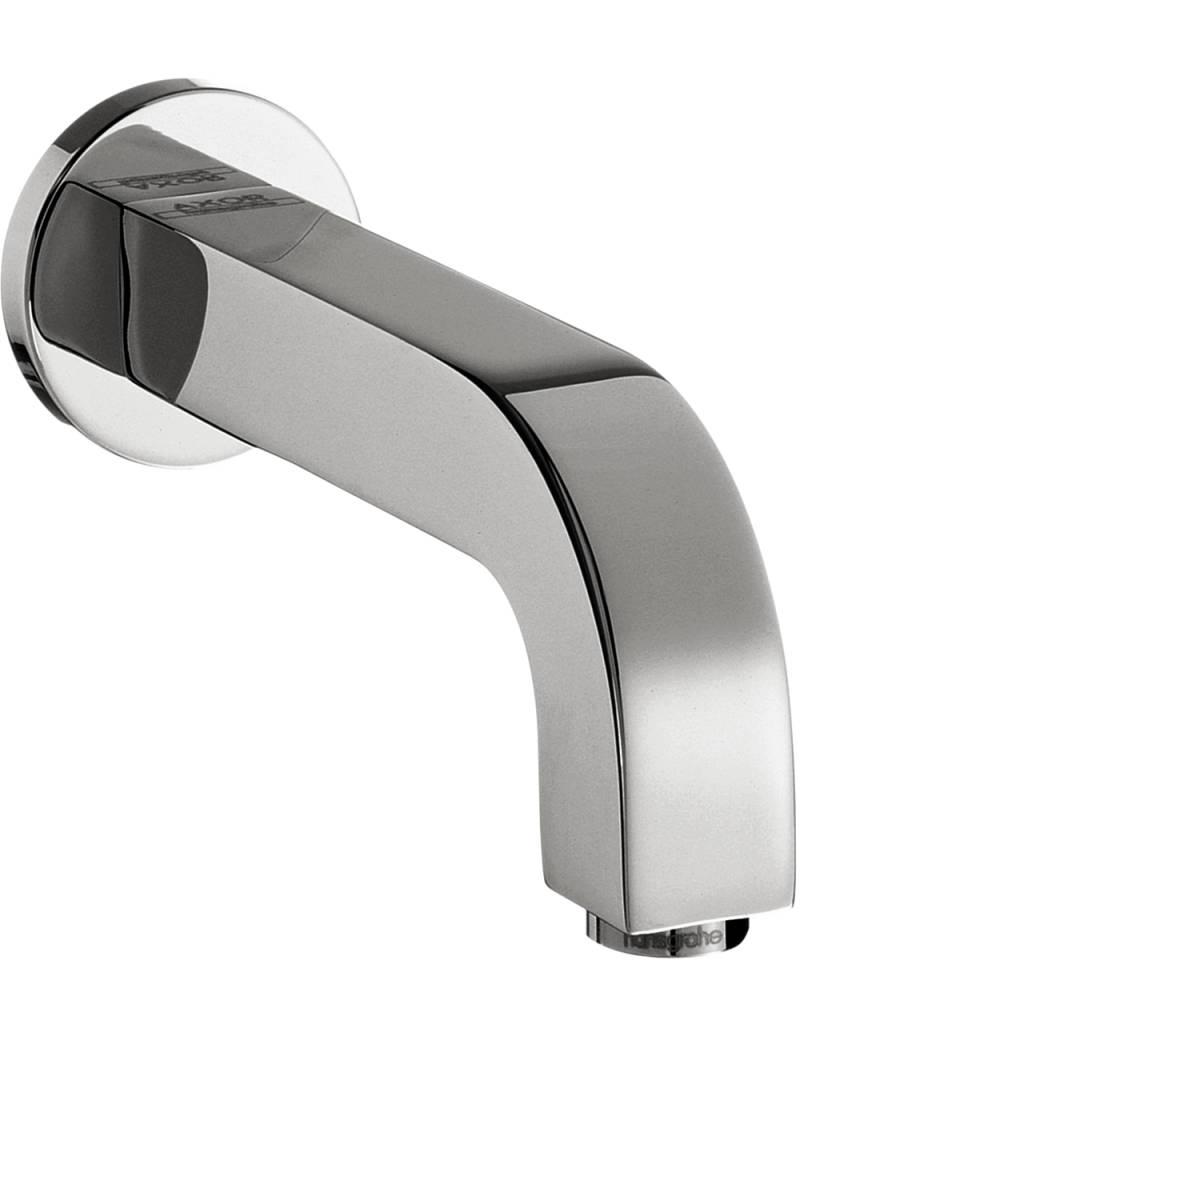 Bath spout, Chrome, 39410001